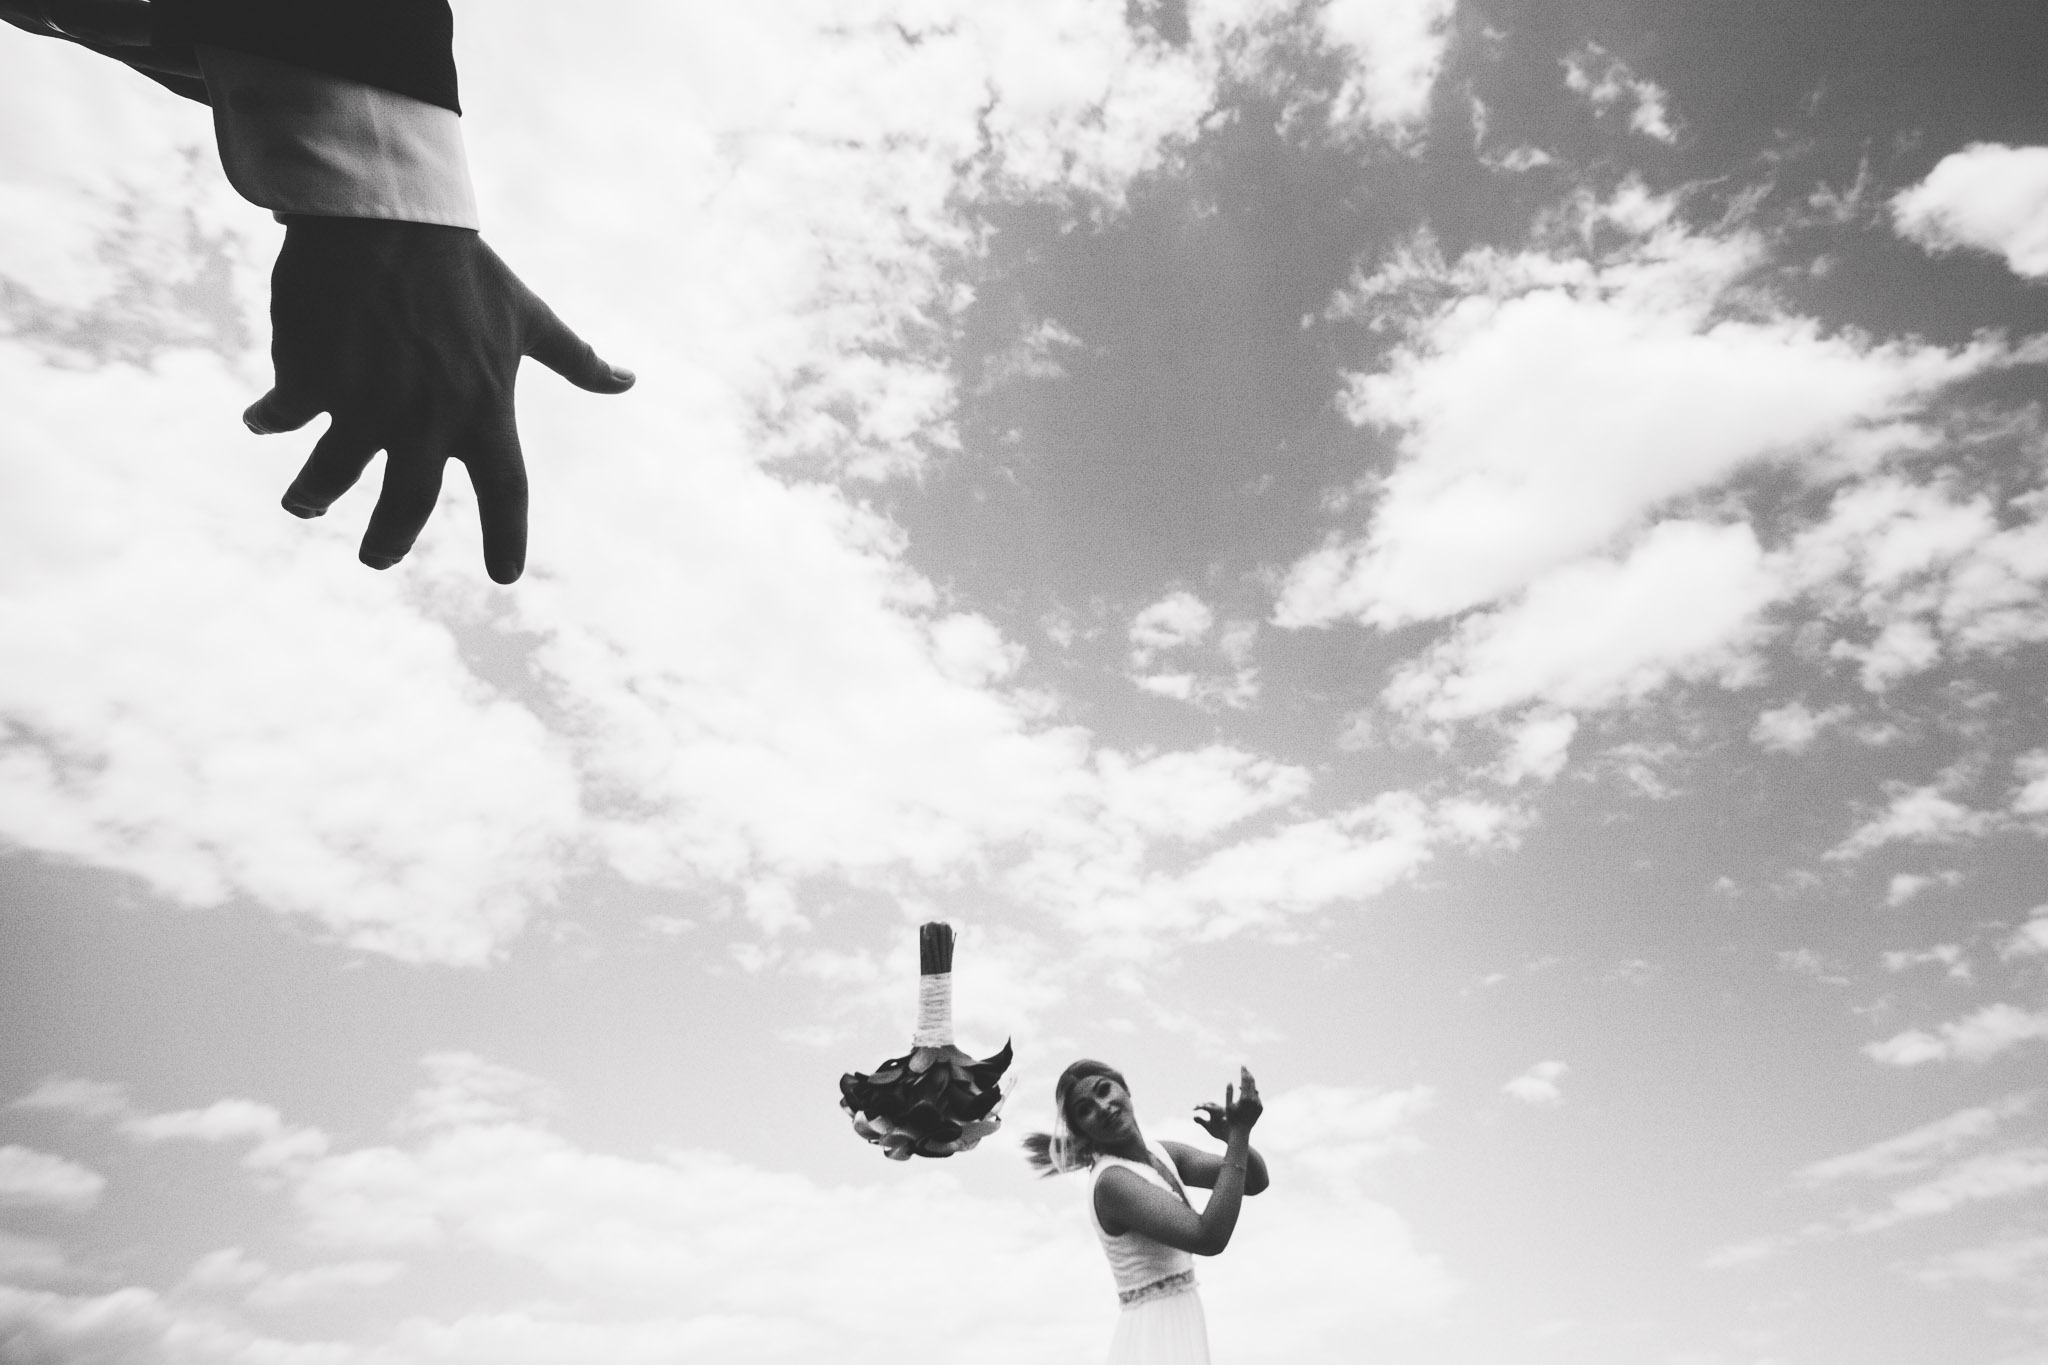 undphotography, undmedia, irina Ionescu, fotograf, fotograf constanta, fotograf profesionist constanta, fotograf nunta, fotograf nunta constanta, fotograf botez, fotograf botez constanta, fotograf familie, fotograf familie constanta, fotograf newborn, fotograf newborn constanta, fotograf maternitate, fotograf maternitate constanta, fotograf studio, fotograf studio constanta, studio foto, studio foto constanta, sedinte foto, sedinte foto constanta, trash the dress, trash the dress constanta, fotograf logodna, fotograf logodna constanta, album foto, album foto constanta, fotograf corporate, fotograf corporate constanta, fotografie eveniment, fotografie eveniment constanta, fotograf bucuresti, fotograf nunta bucuresti, fotograf brasov, fotograf nunta brasov, fotograf cluj, fotograf nunta clujalbum foto,album foto constanta,fotograf botez,fotograf botez constanta,fotograf constanta,fotograf corporate,fotograf corporate constanta,fotograf familie,fotograf familie constanta,fotograf logodna,fotograf logodna constanta,fotograf maternitate,